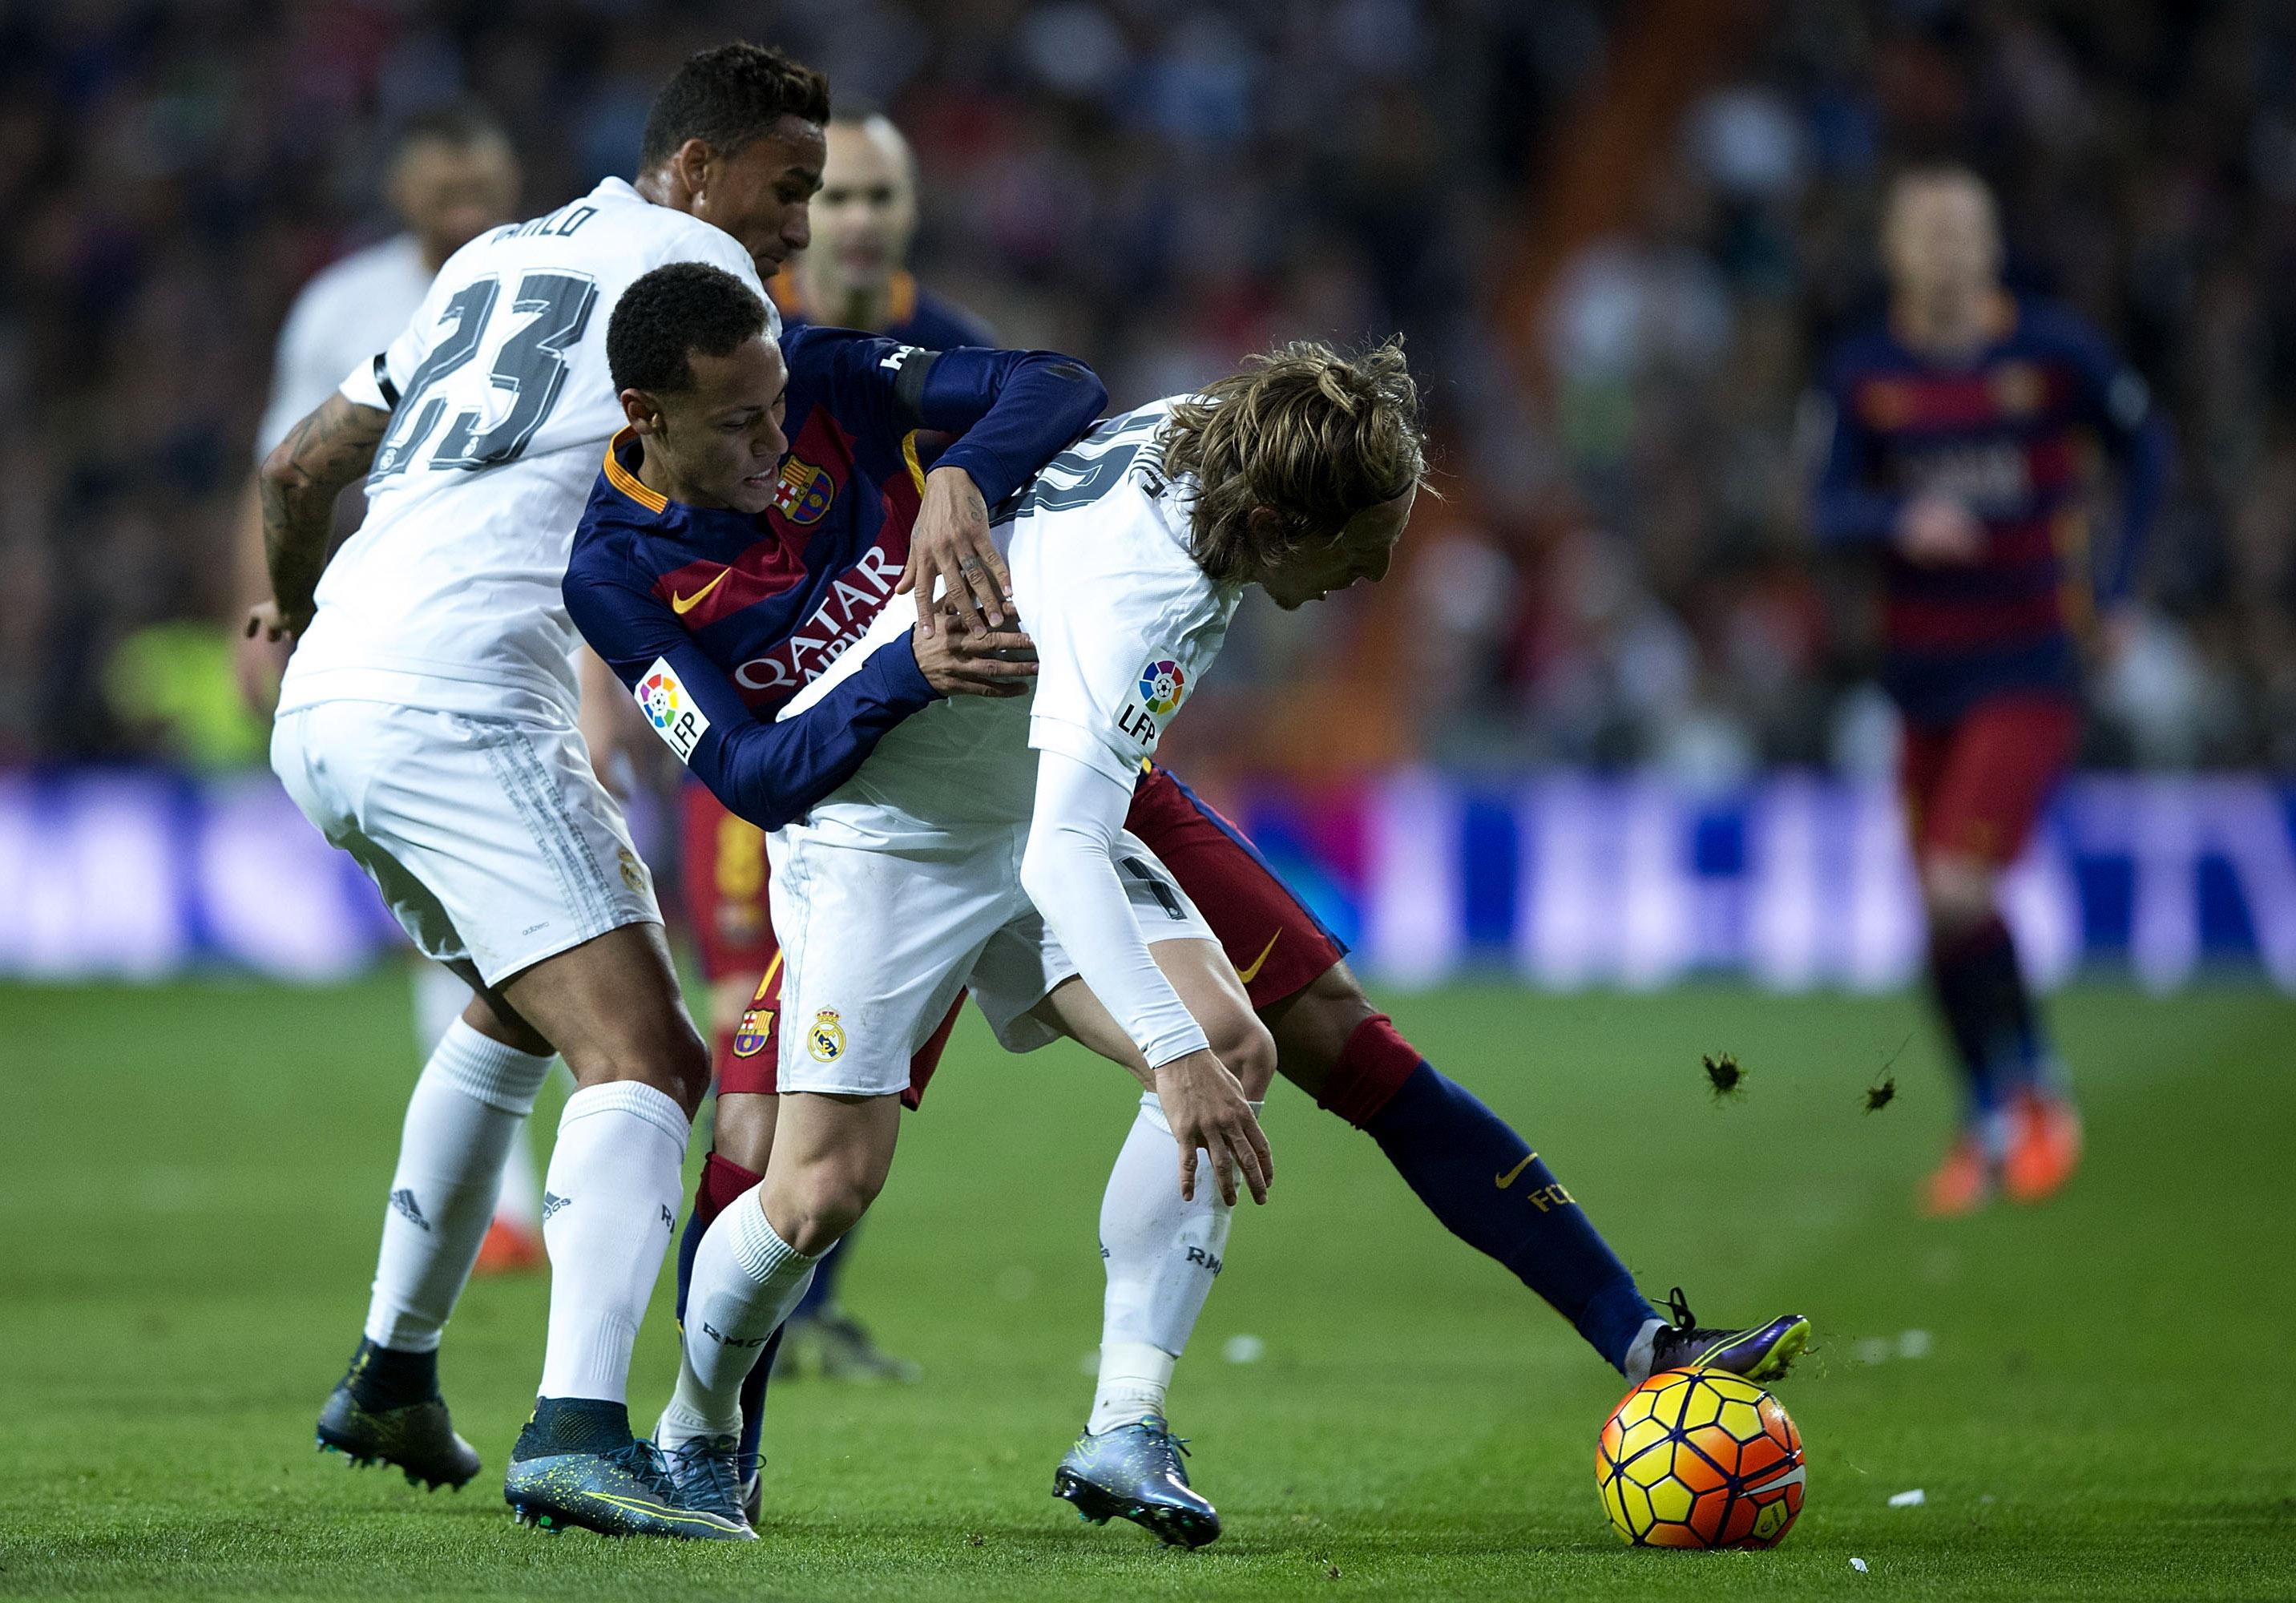 Реал Мадрид - Барселона - 0:4